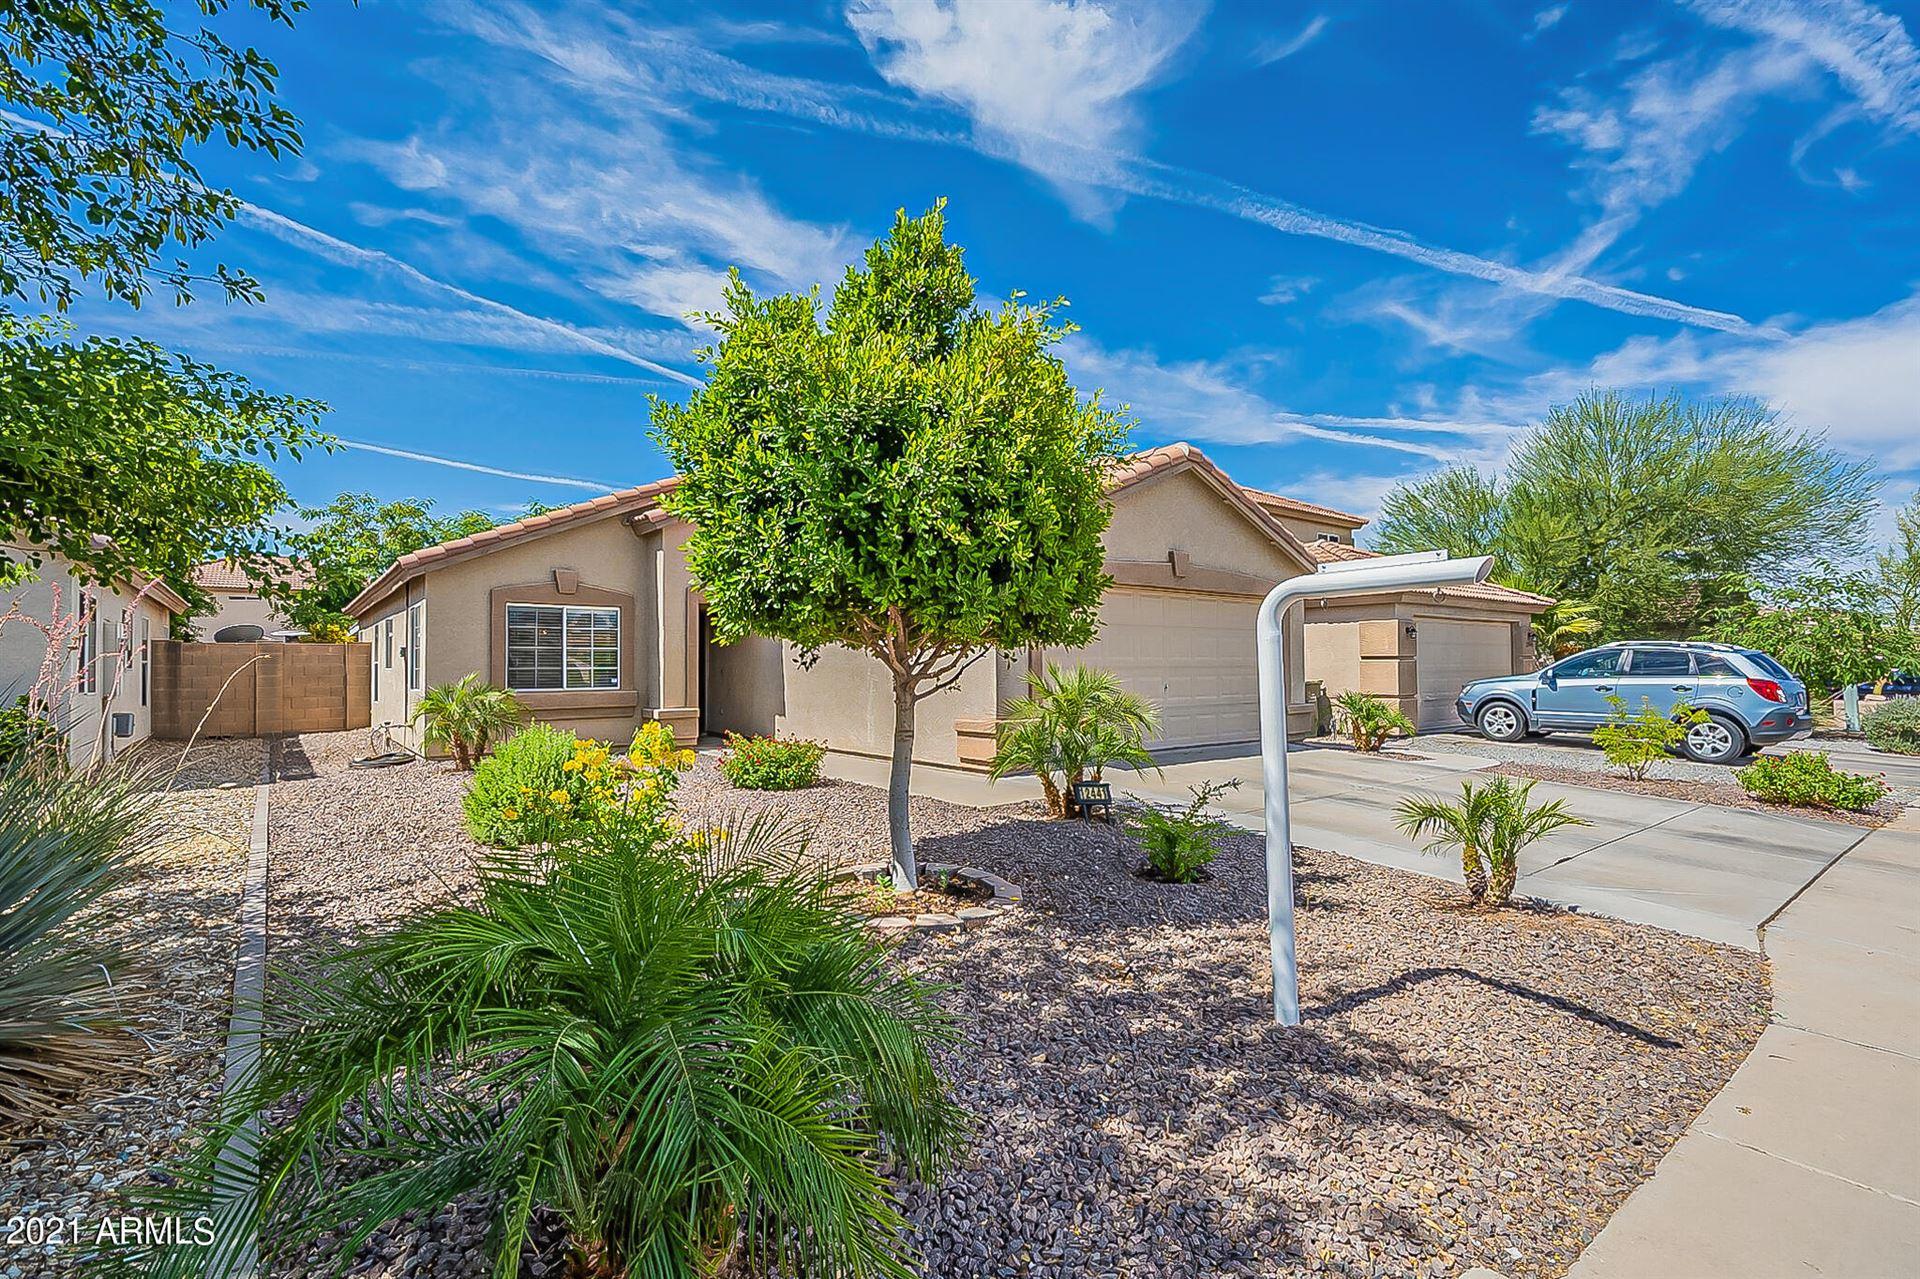 Photo of 12441 W WILLOW Avenue, El Mirage, AZ 85335 (MLS # 6247352)